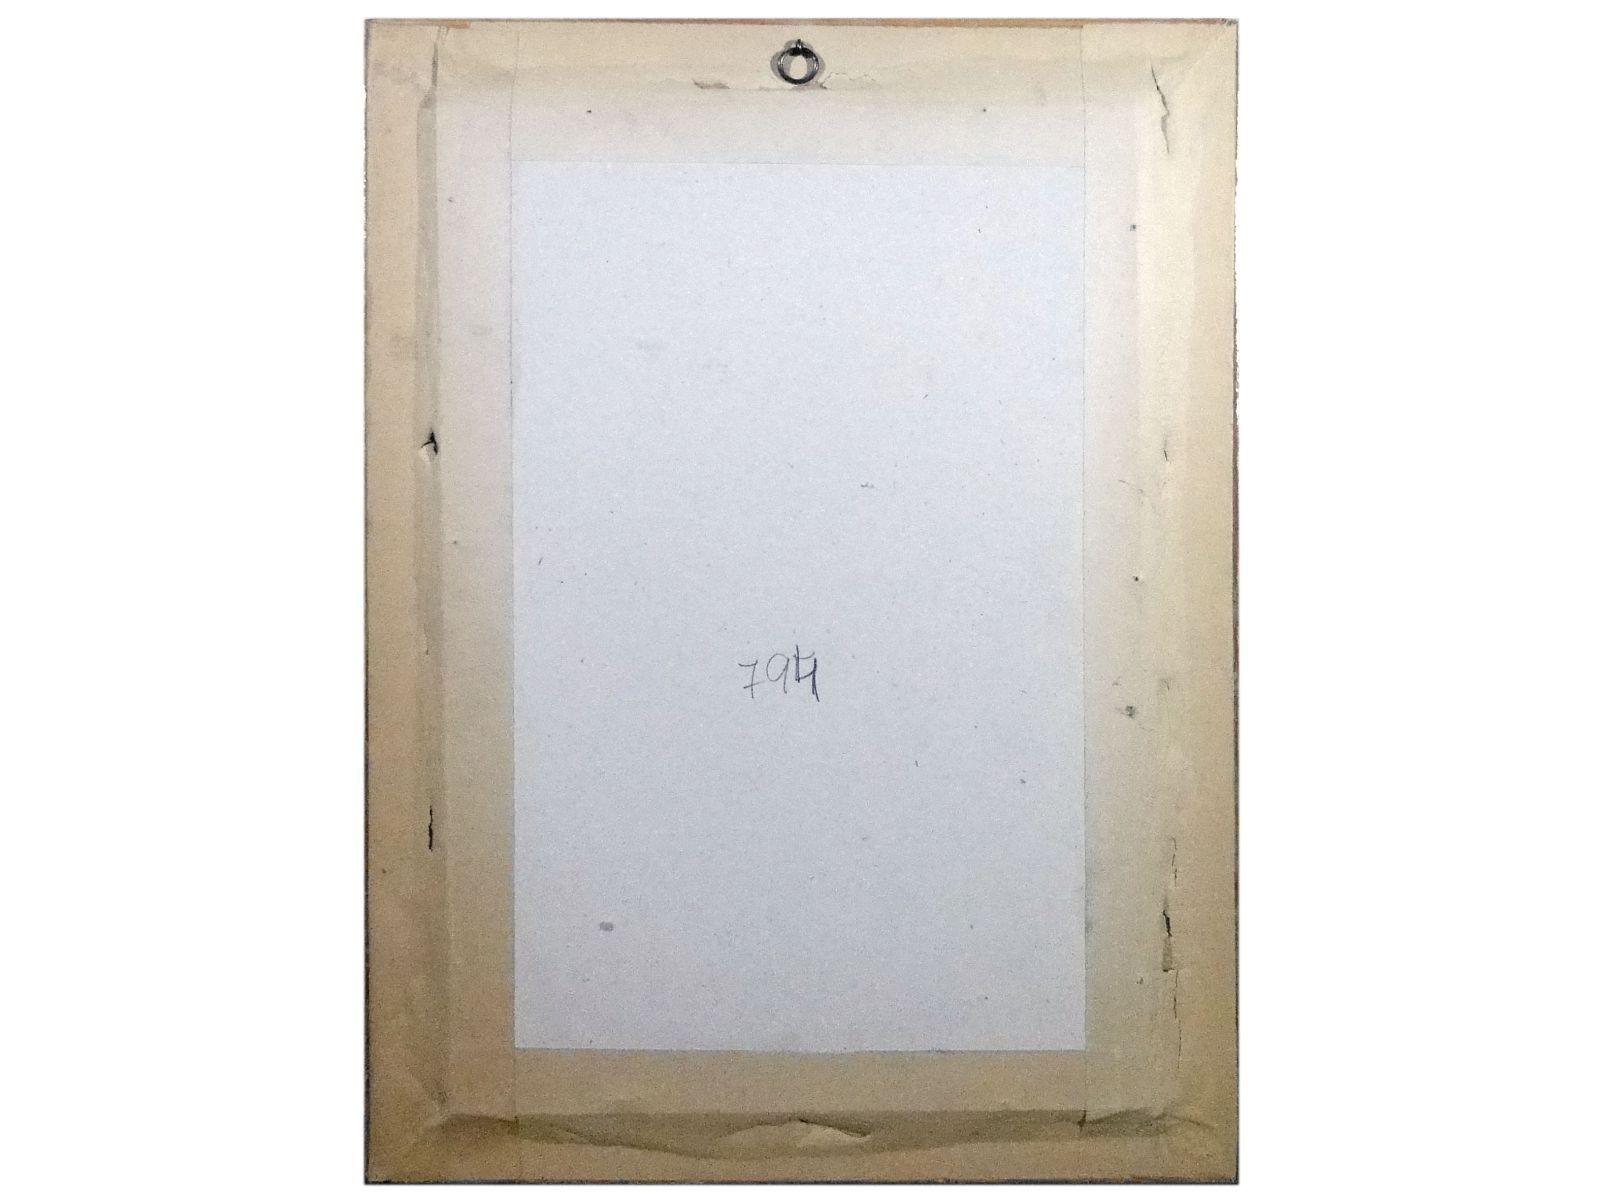 DSC04546.JPG (1600×1200)